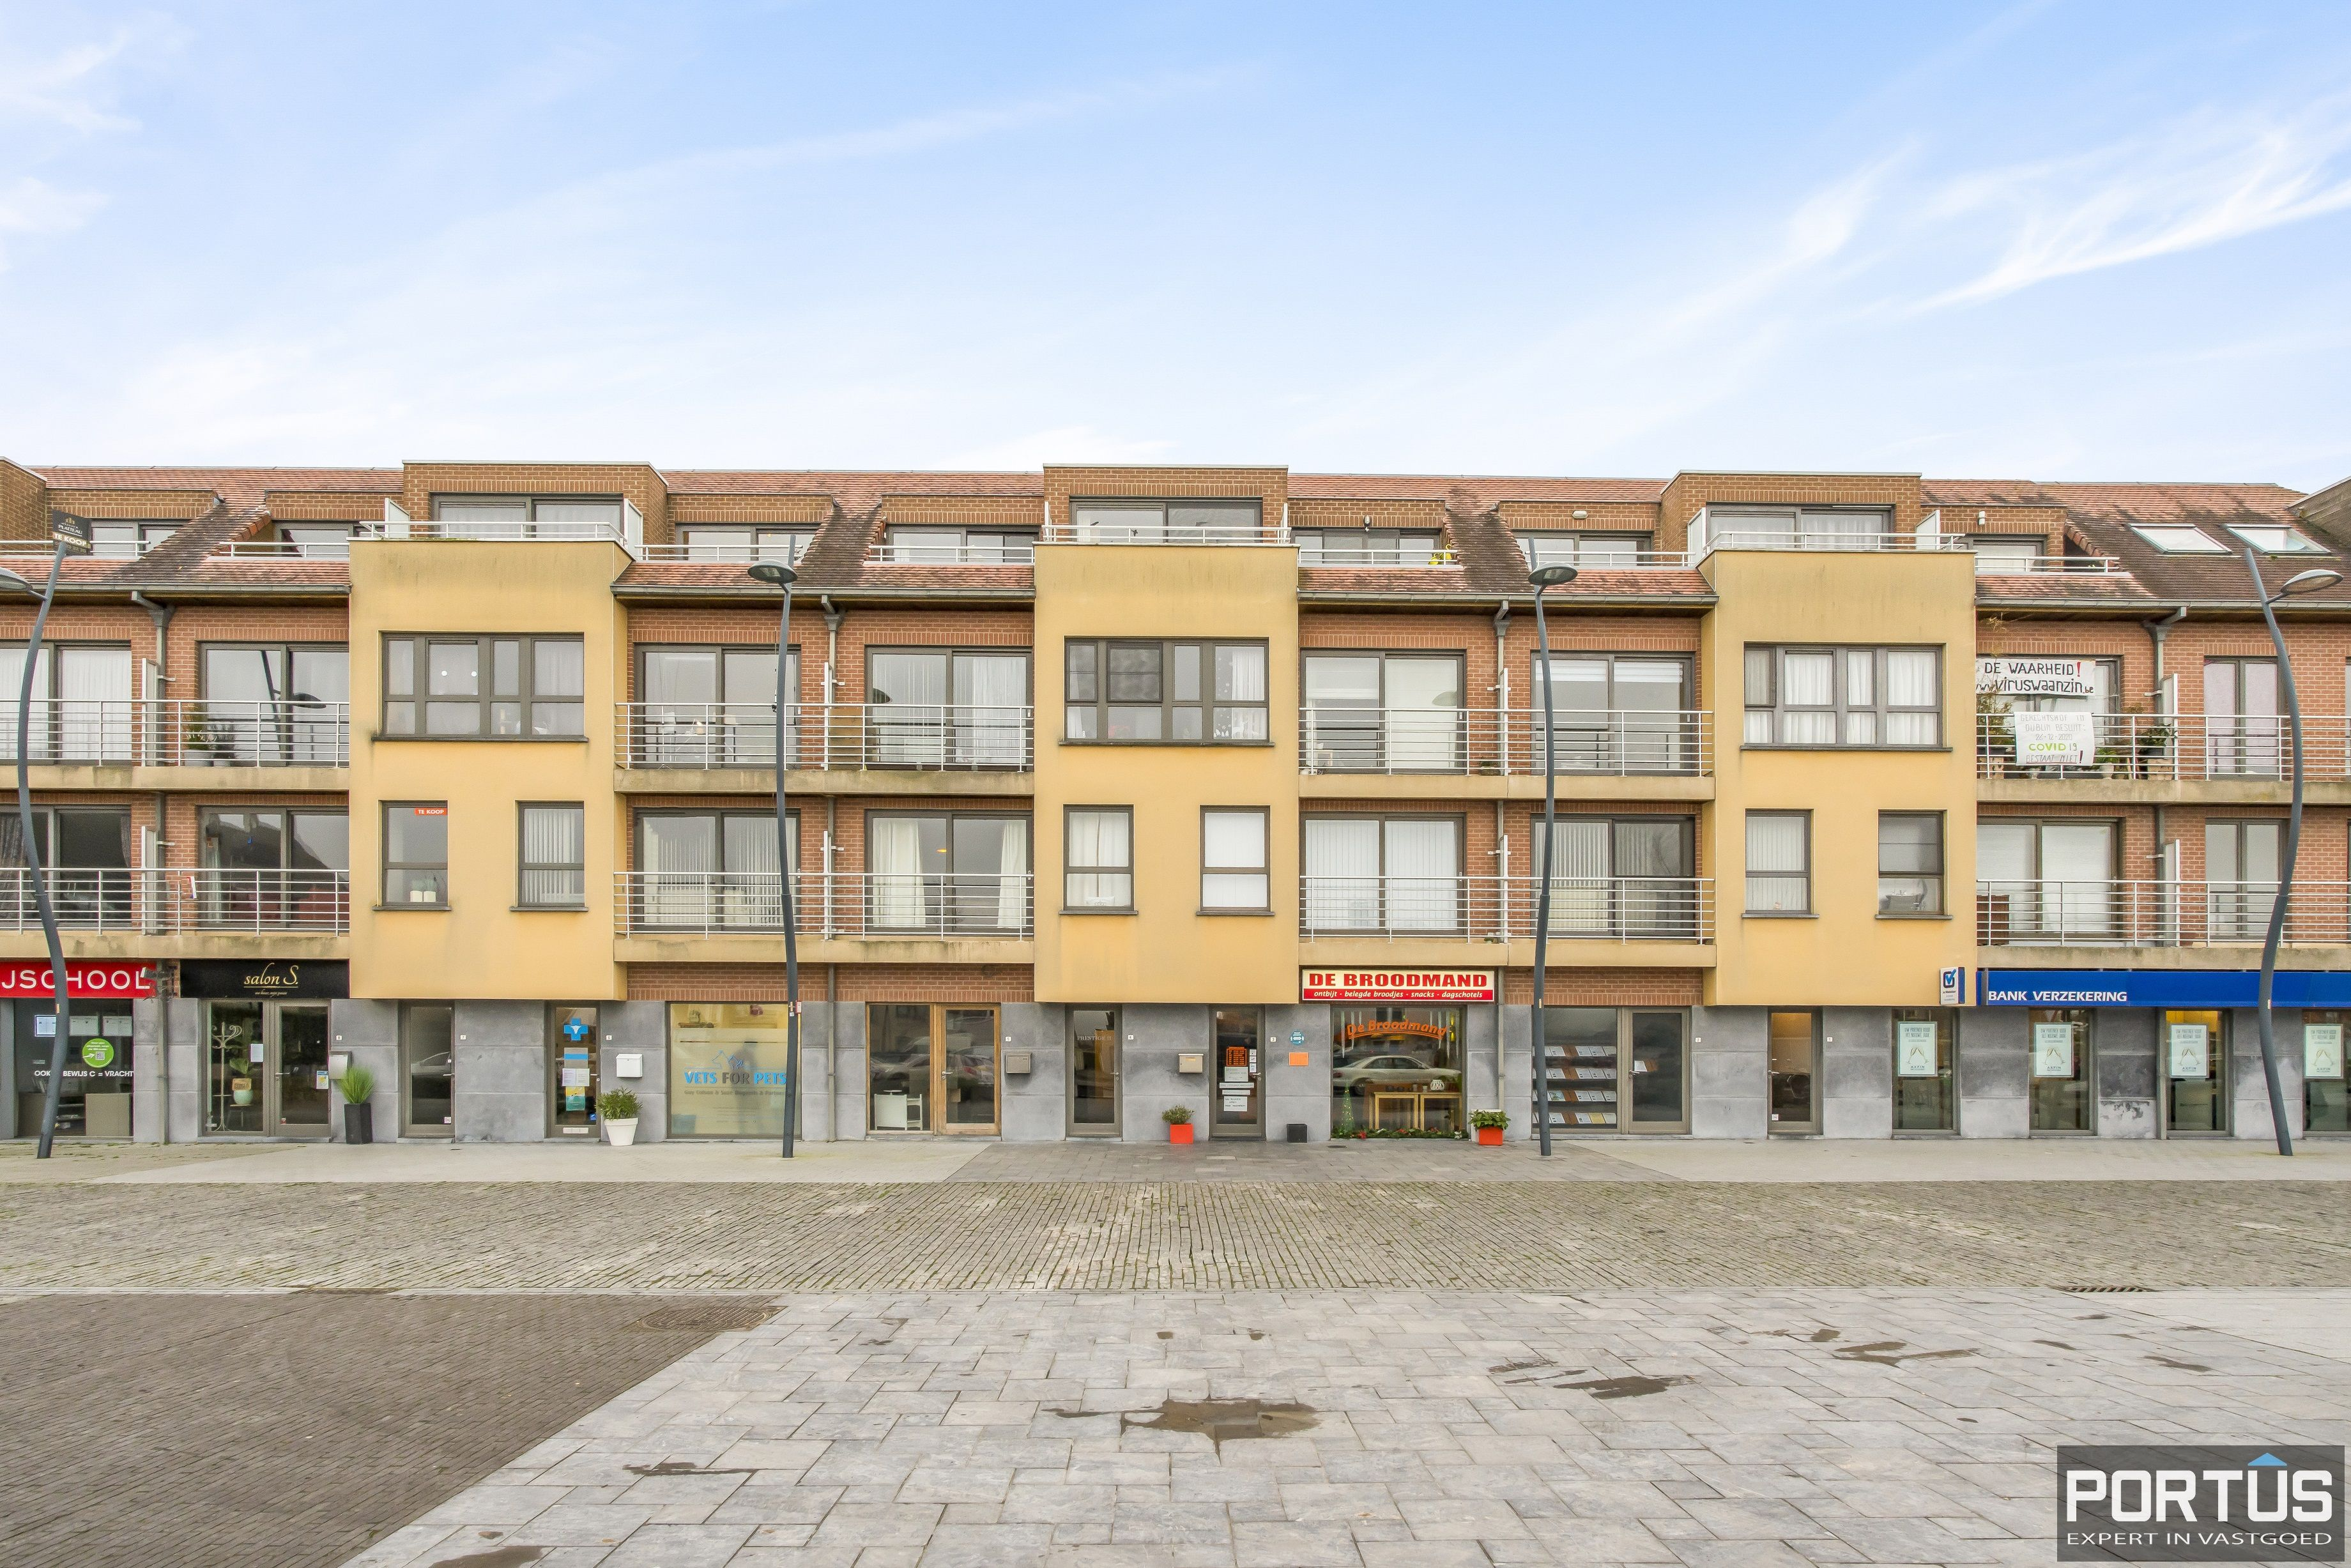 Instapklaar appartement met 1 slaapkamer te koop te Westende - 12053